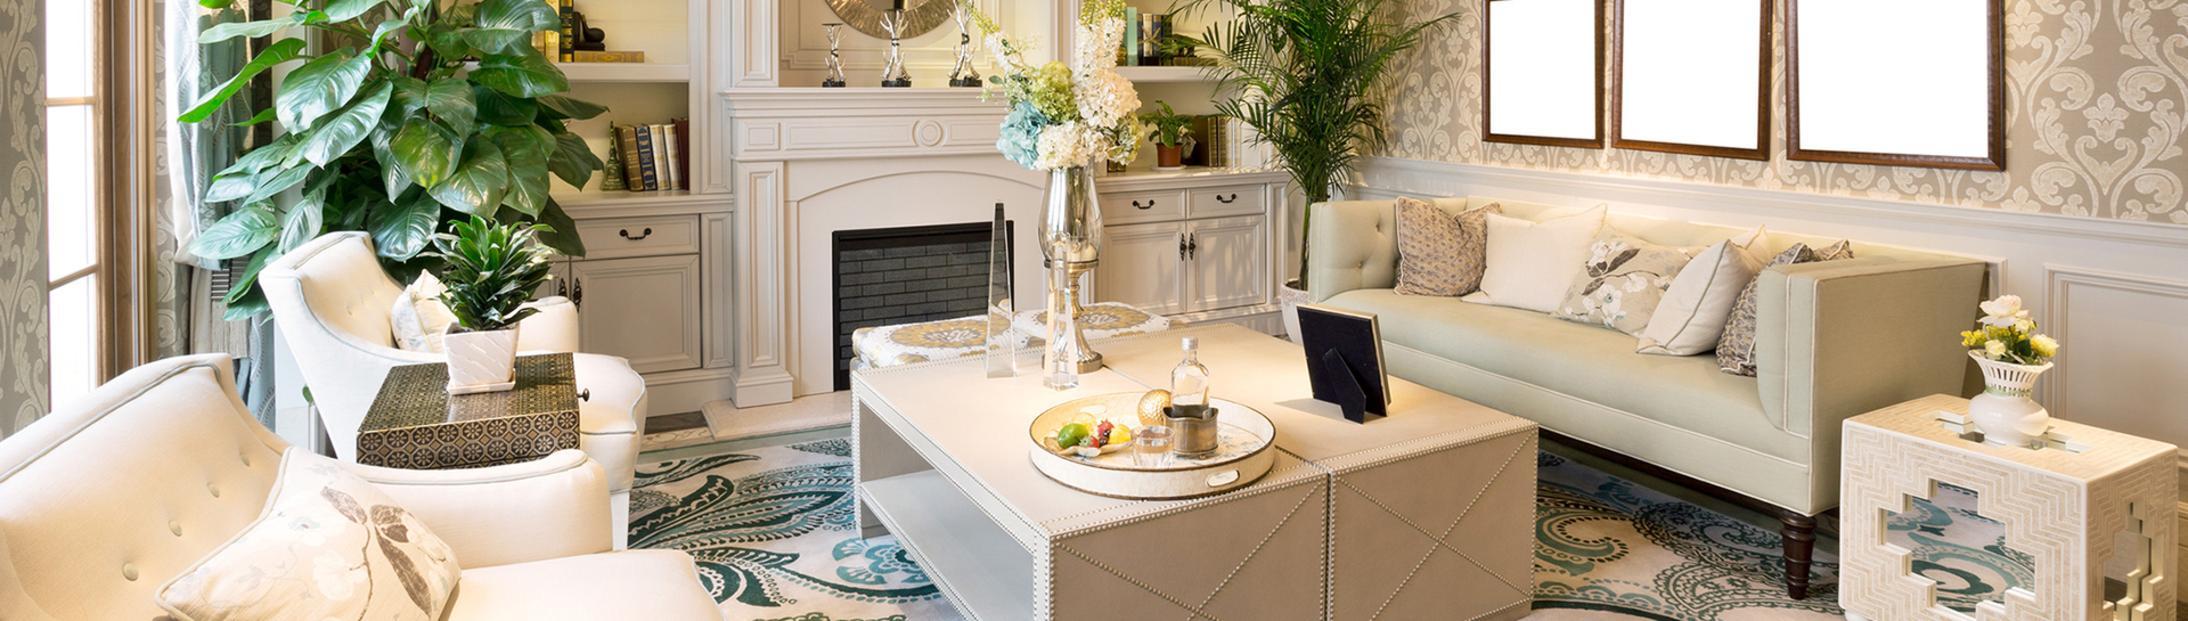 Brooklyn's best interior designers interior designers Kovalenko